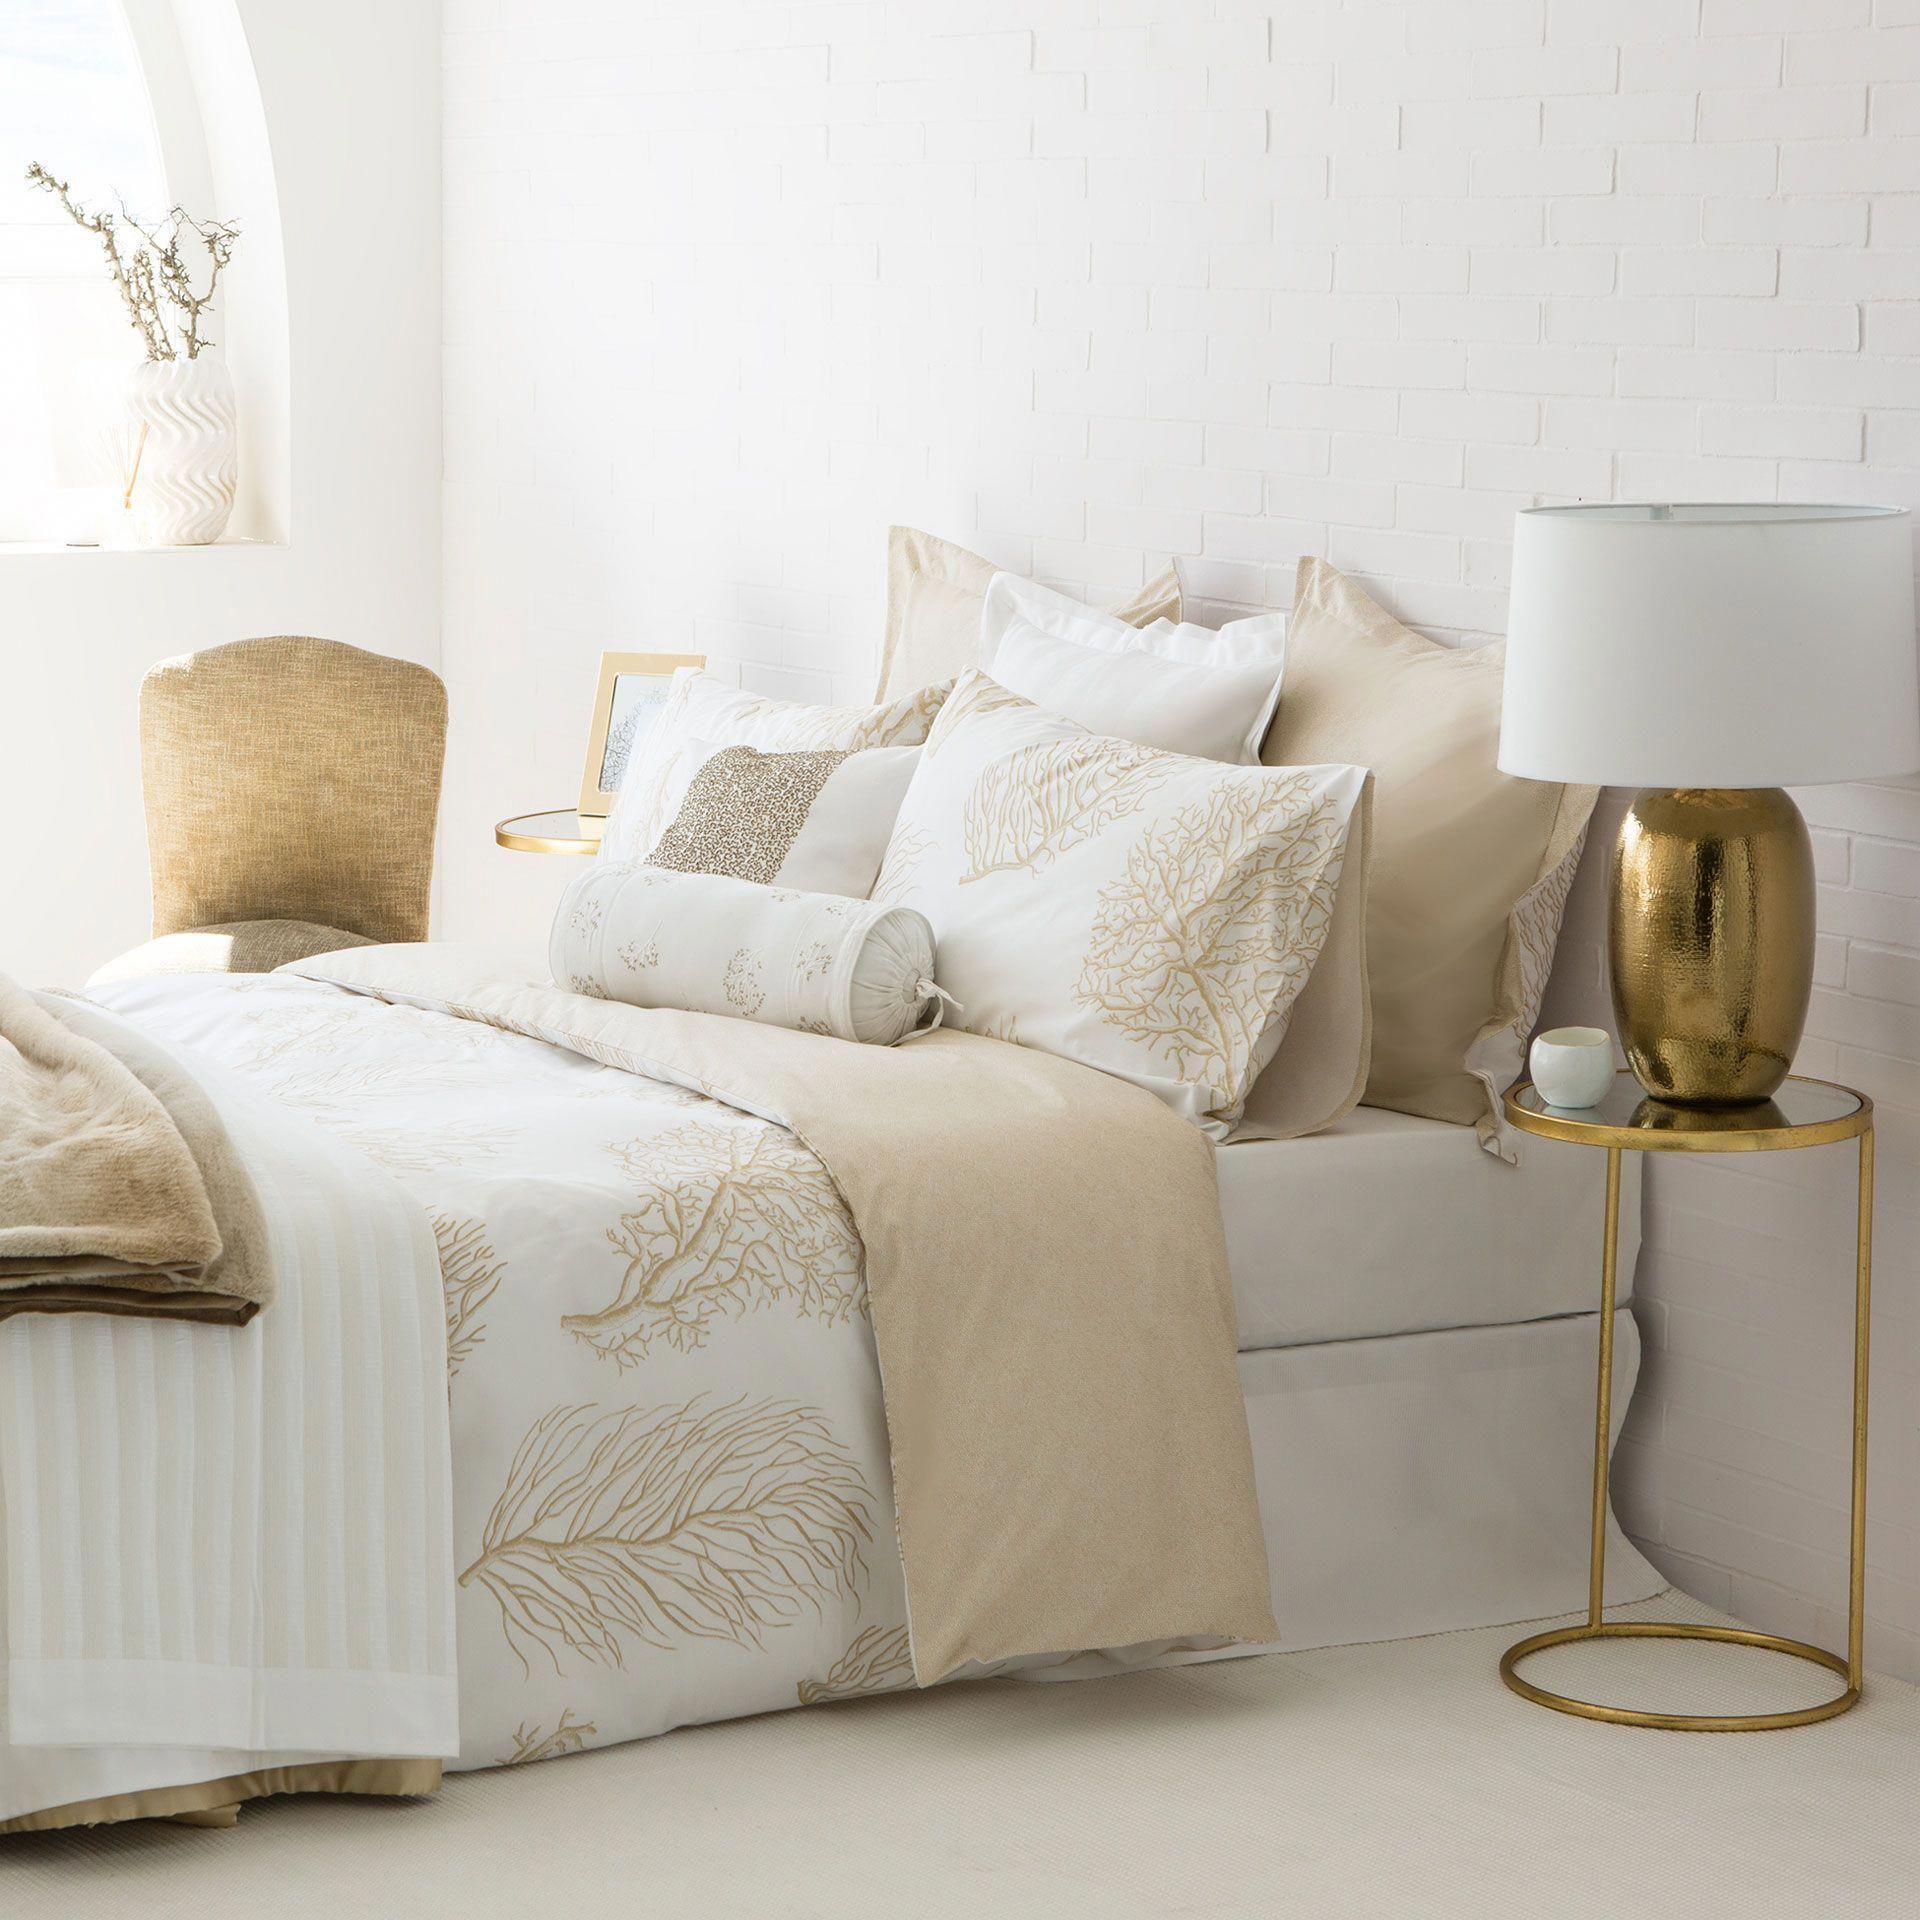 FavouriteBedLinenIdeas #LimitlessSaves  Zara home bedroom, Bed